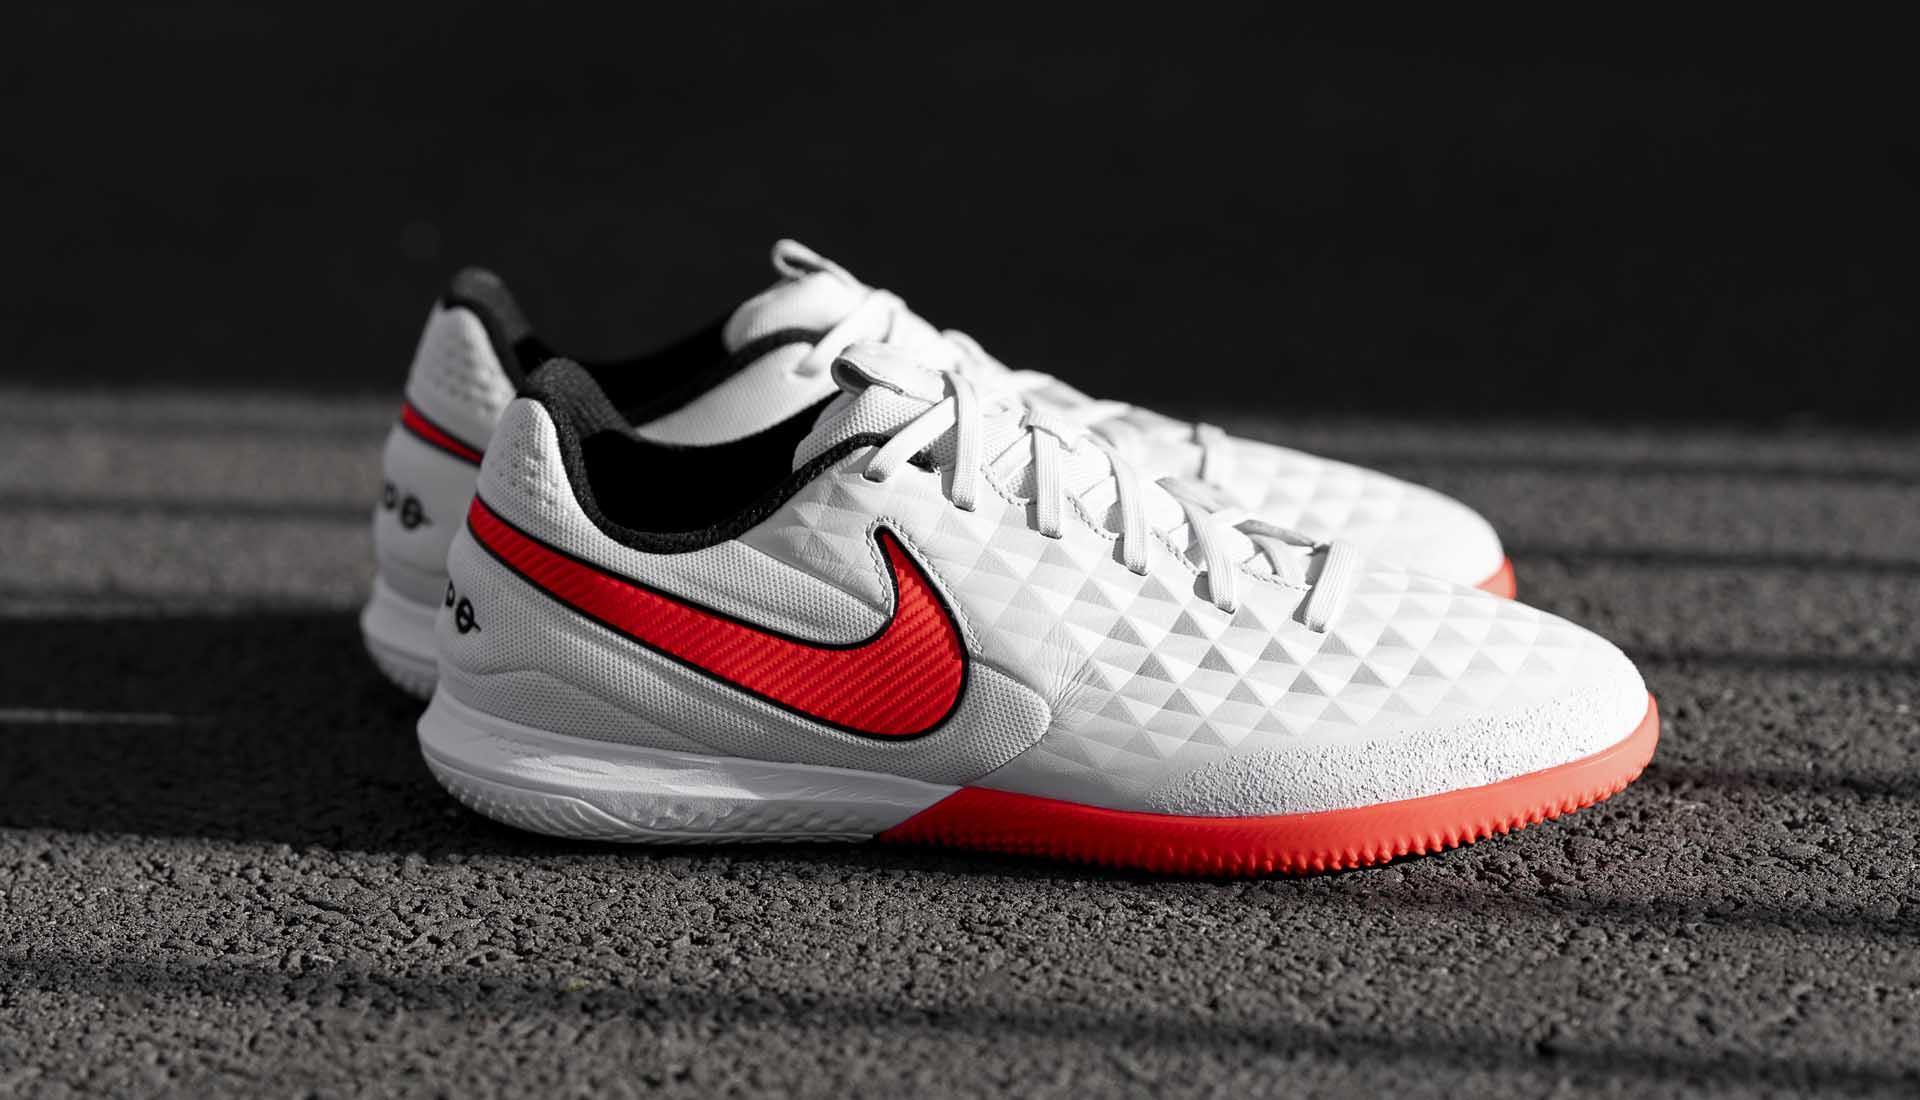 necesario alma Negar  Nike Launch The Tiempo VIII React Pro Football Shoes - SoccerBible